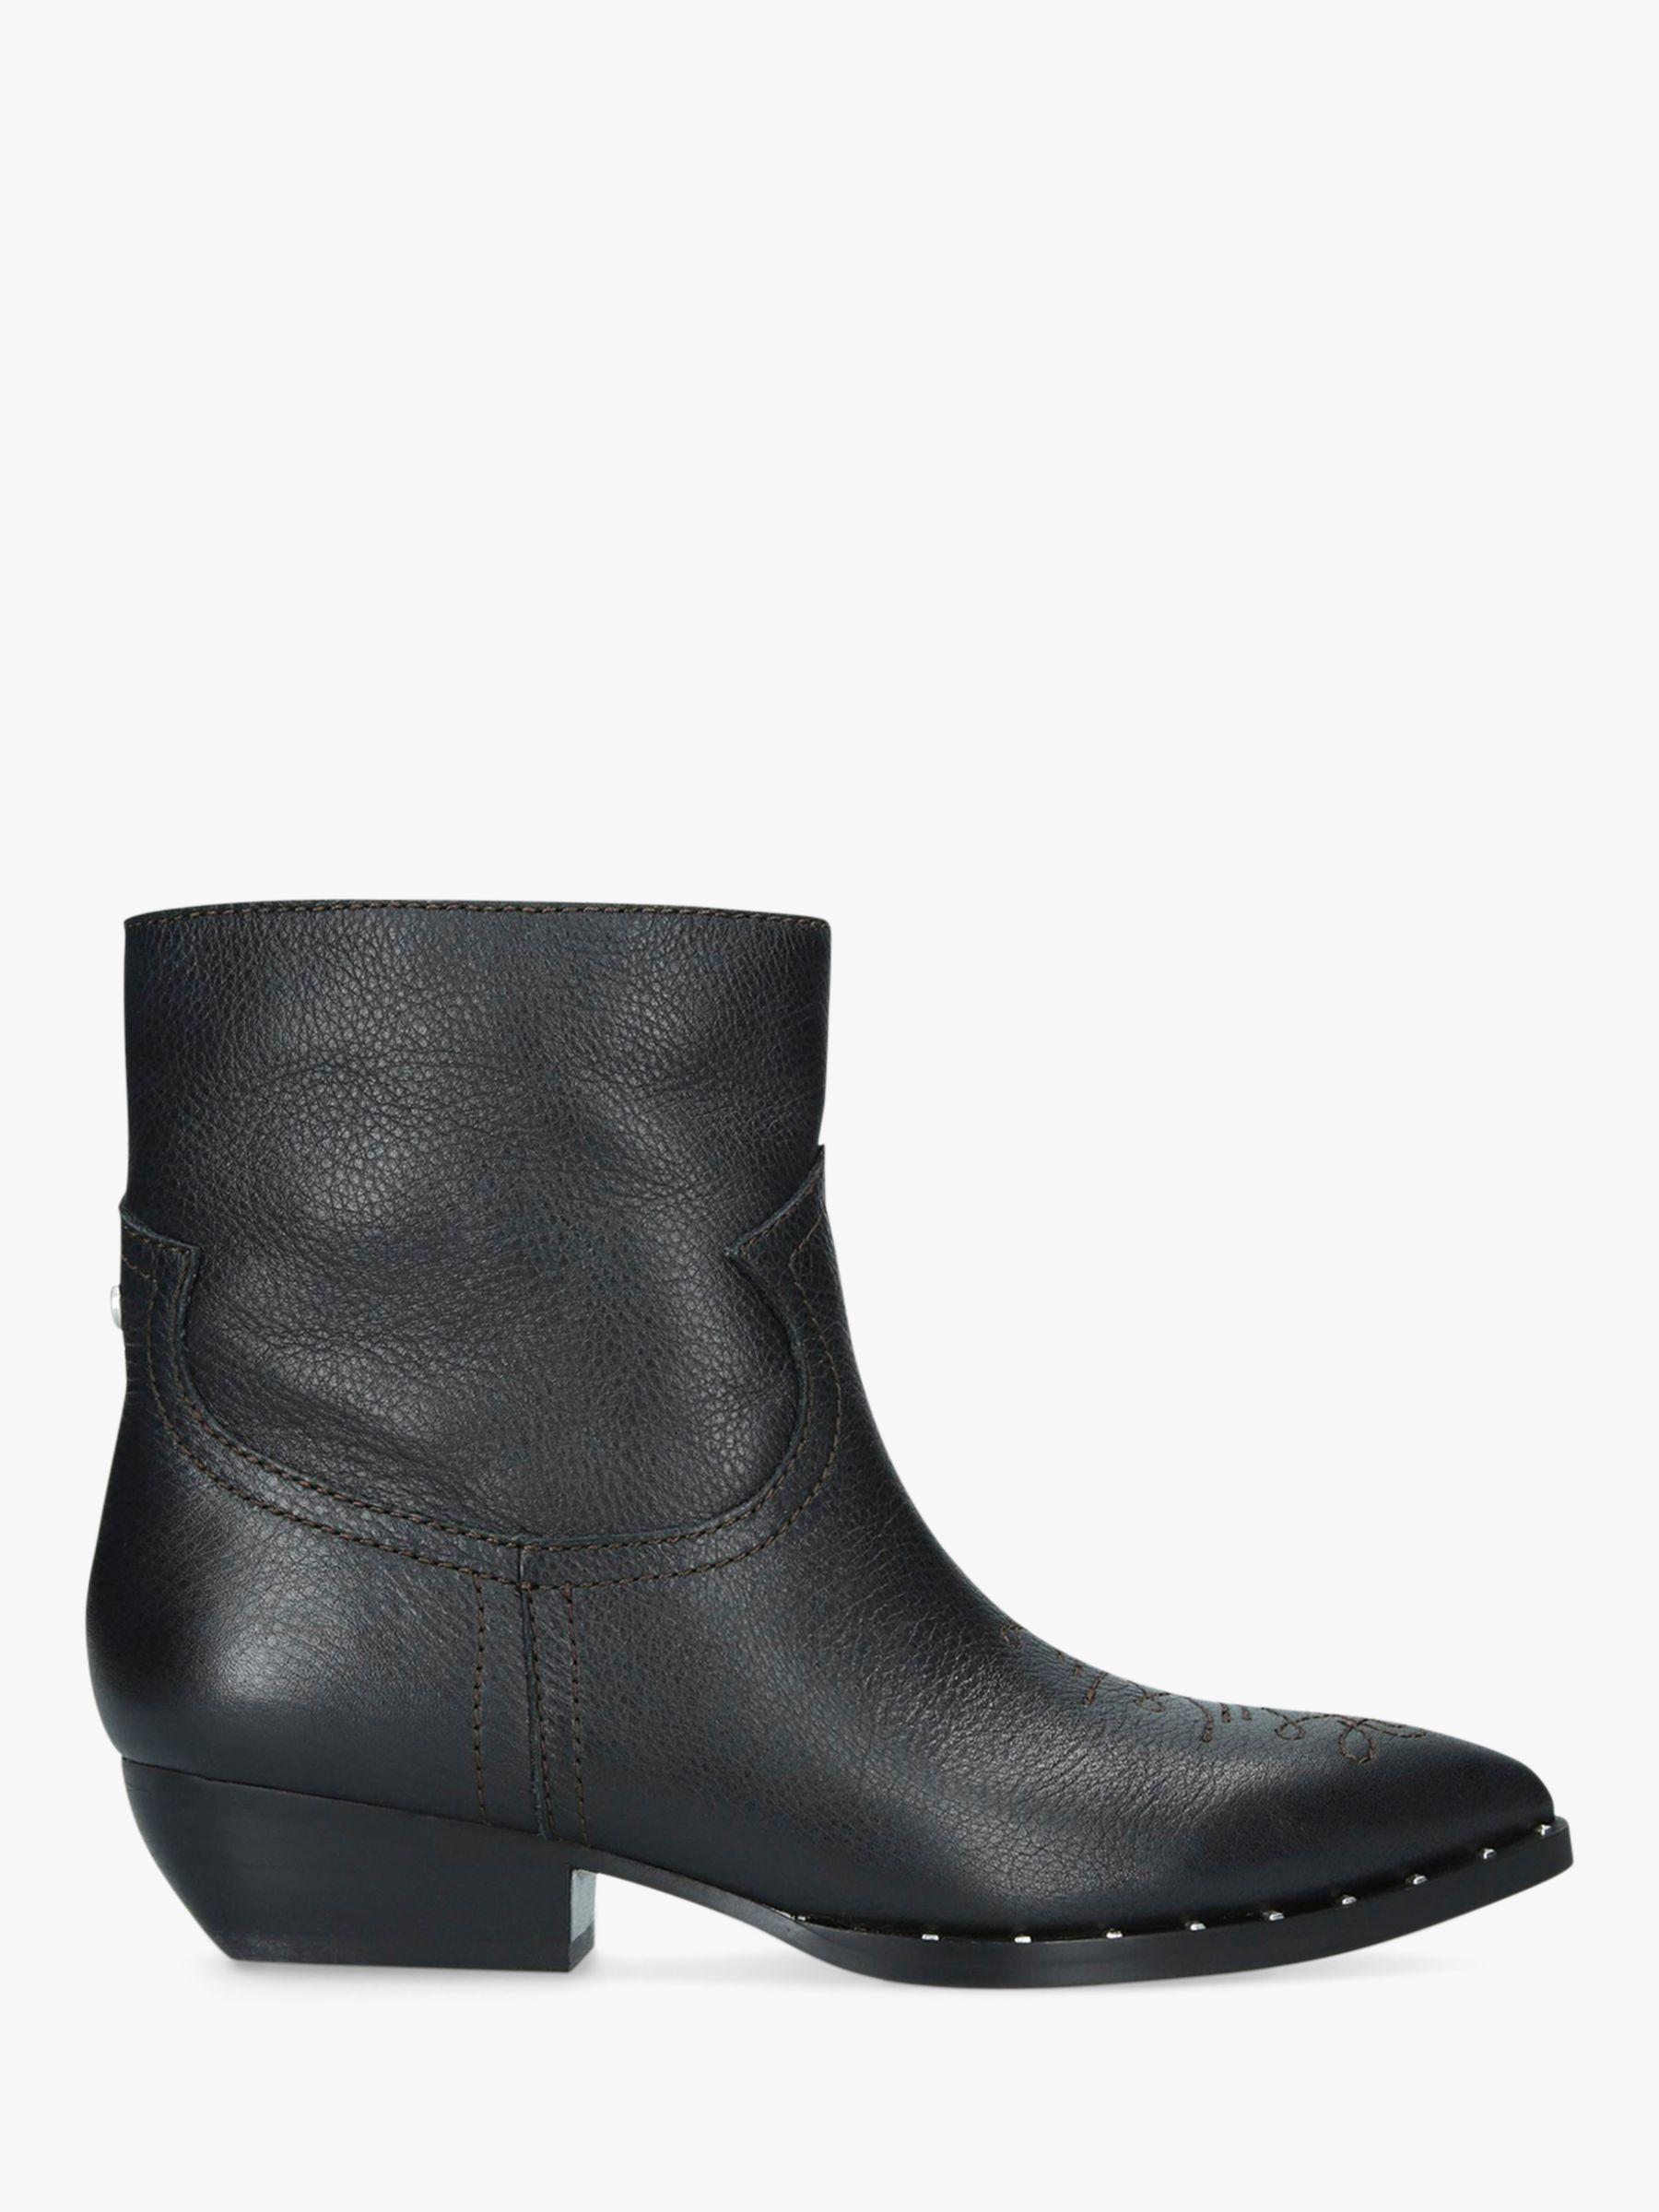 d136639c19a9 Sam Edelman Ava Ankle Boots